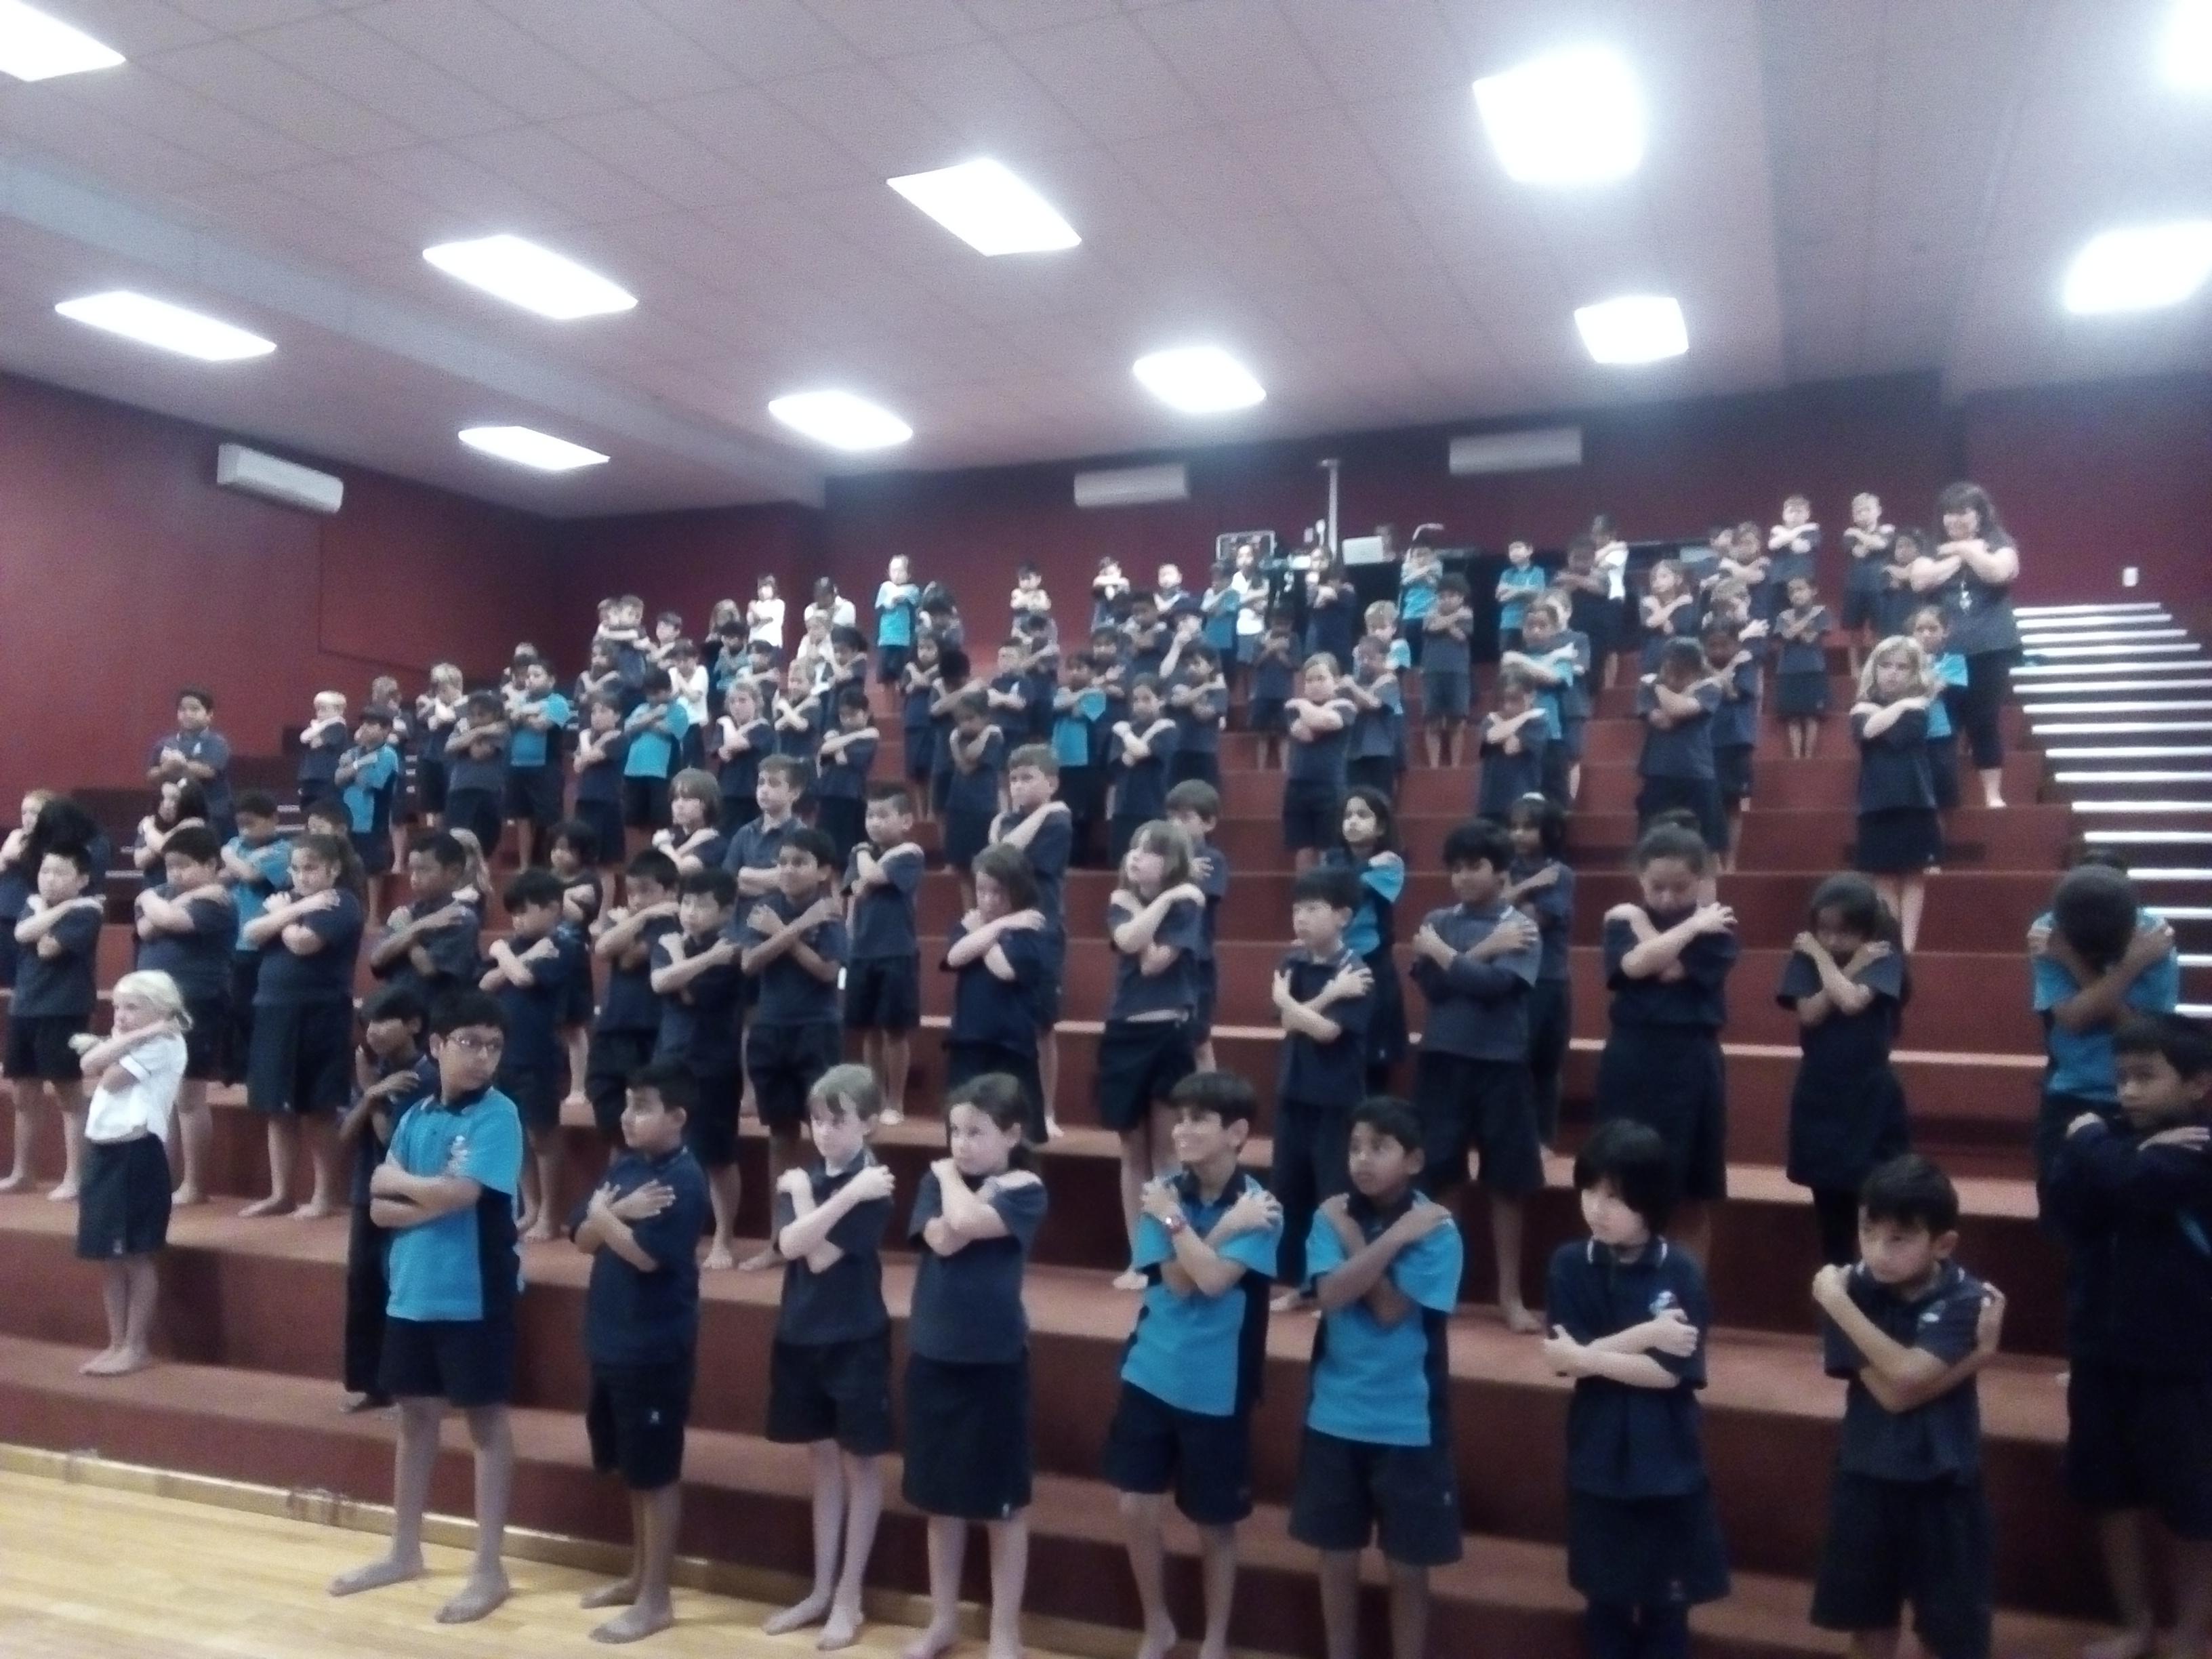 Blockhouse Bay Primary School - Gooooo Nooooodle!!